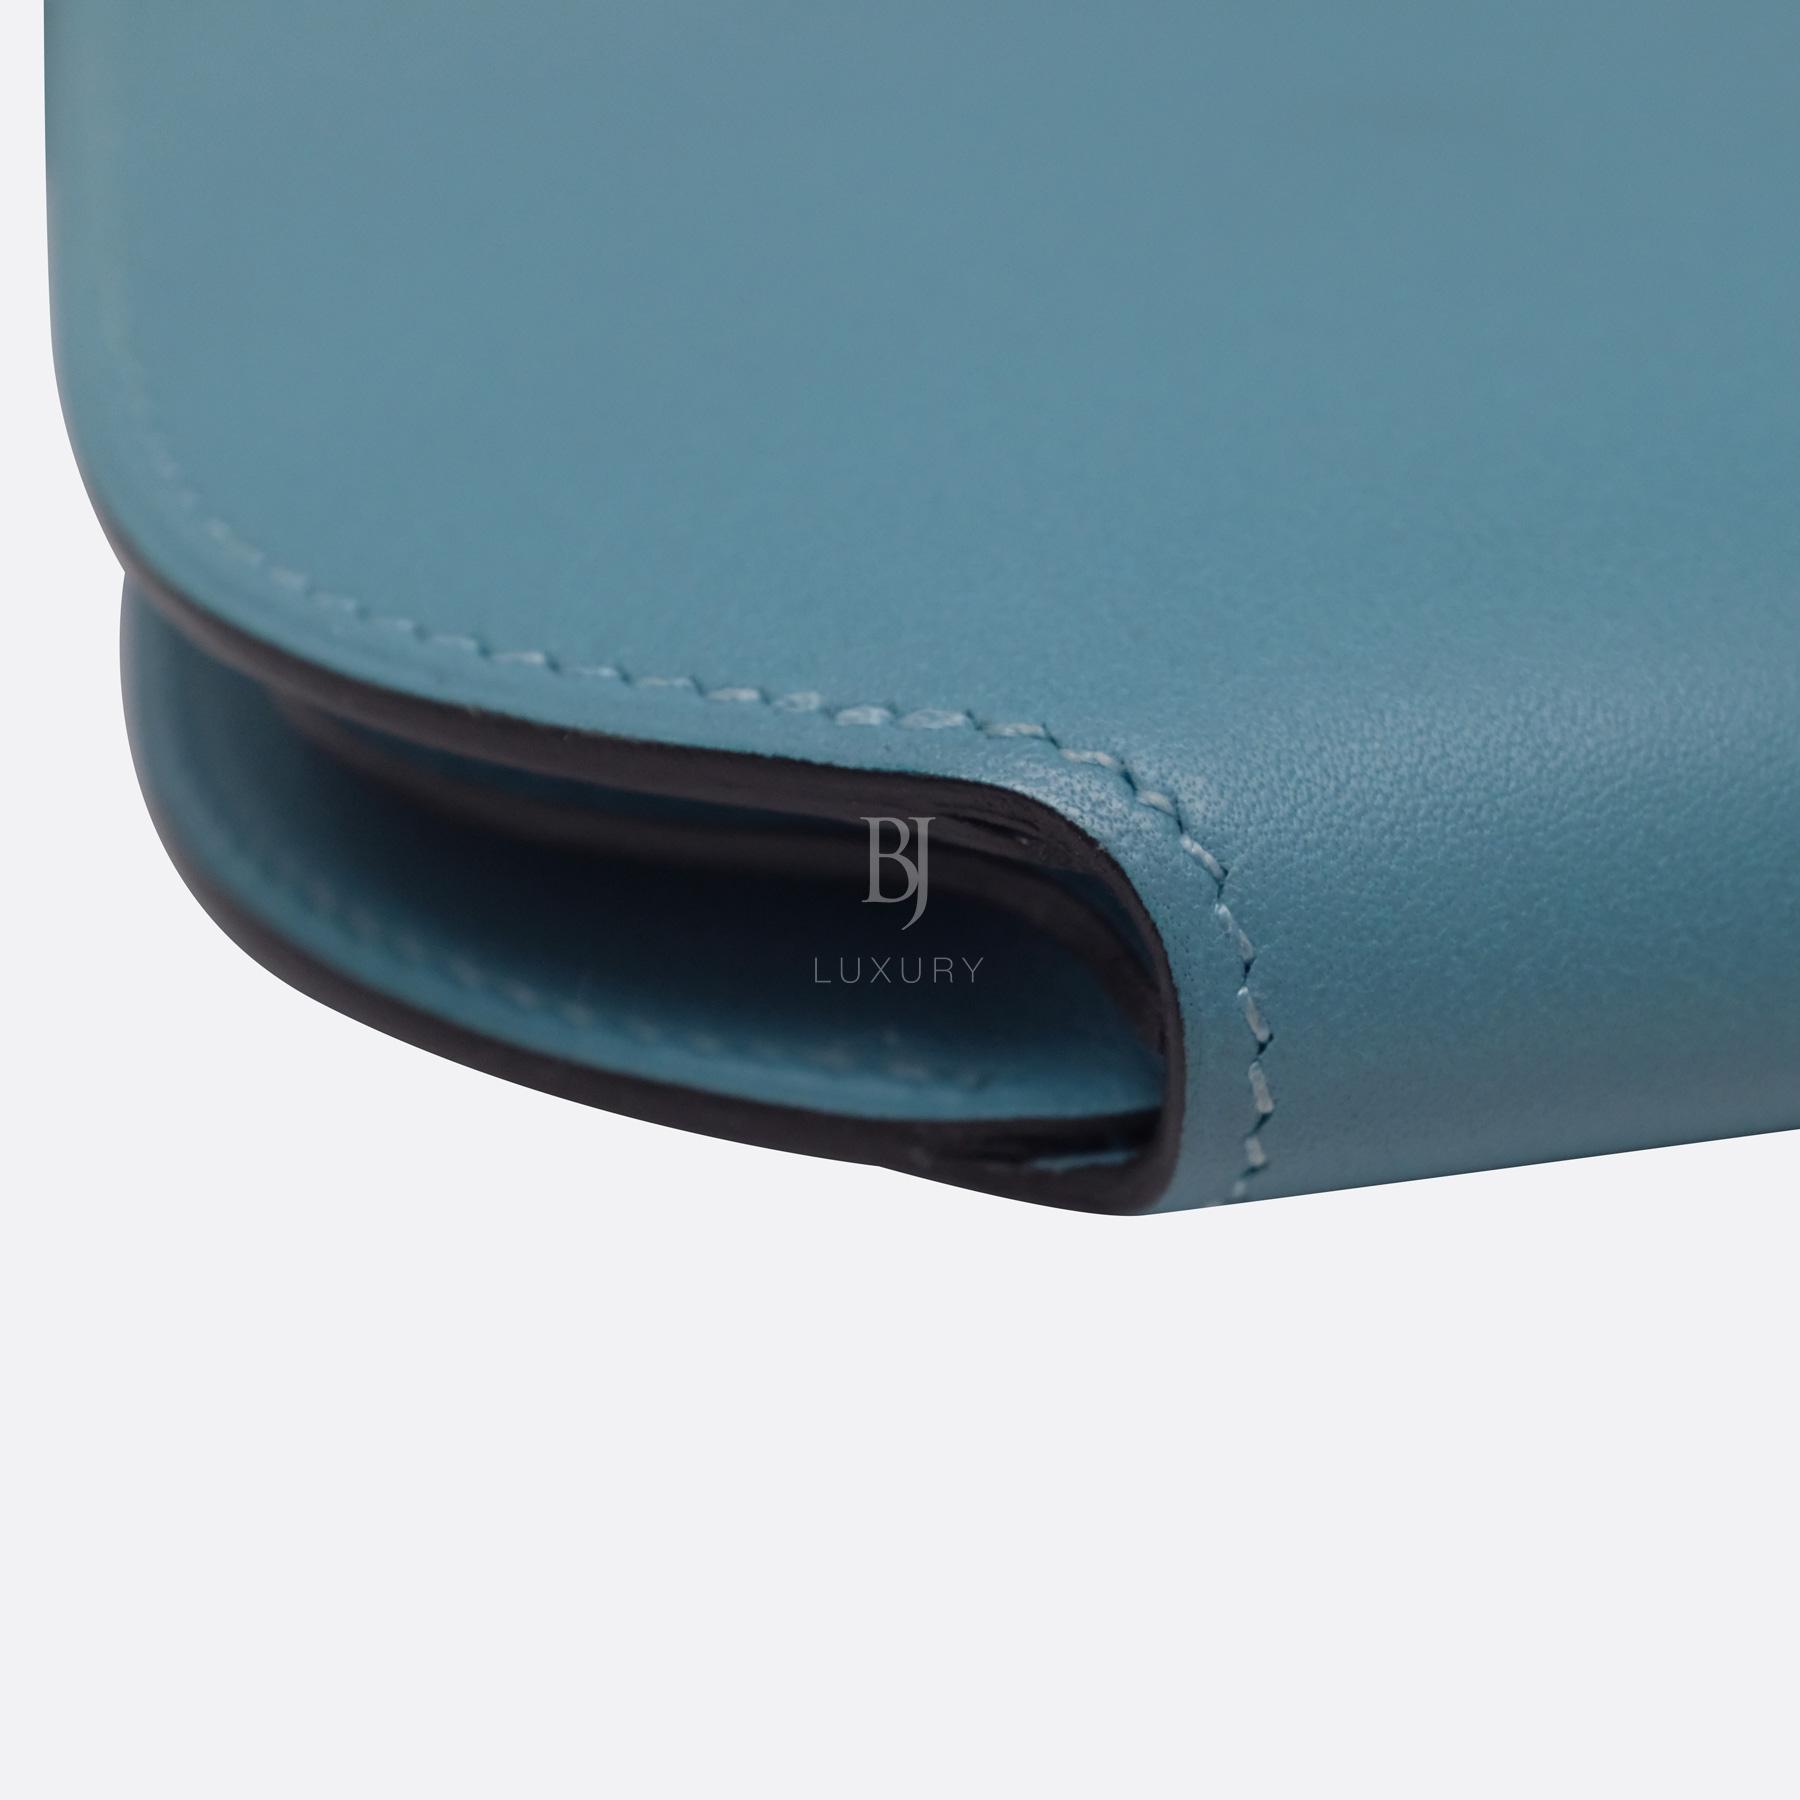 Hermes Conveyor Bag 16 Turquoise Swift Lizard Palladium BJ Luxury 10.jpg